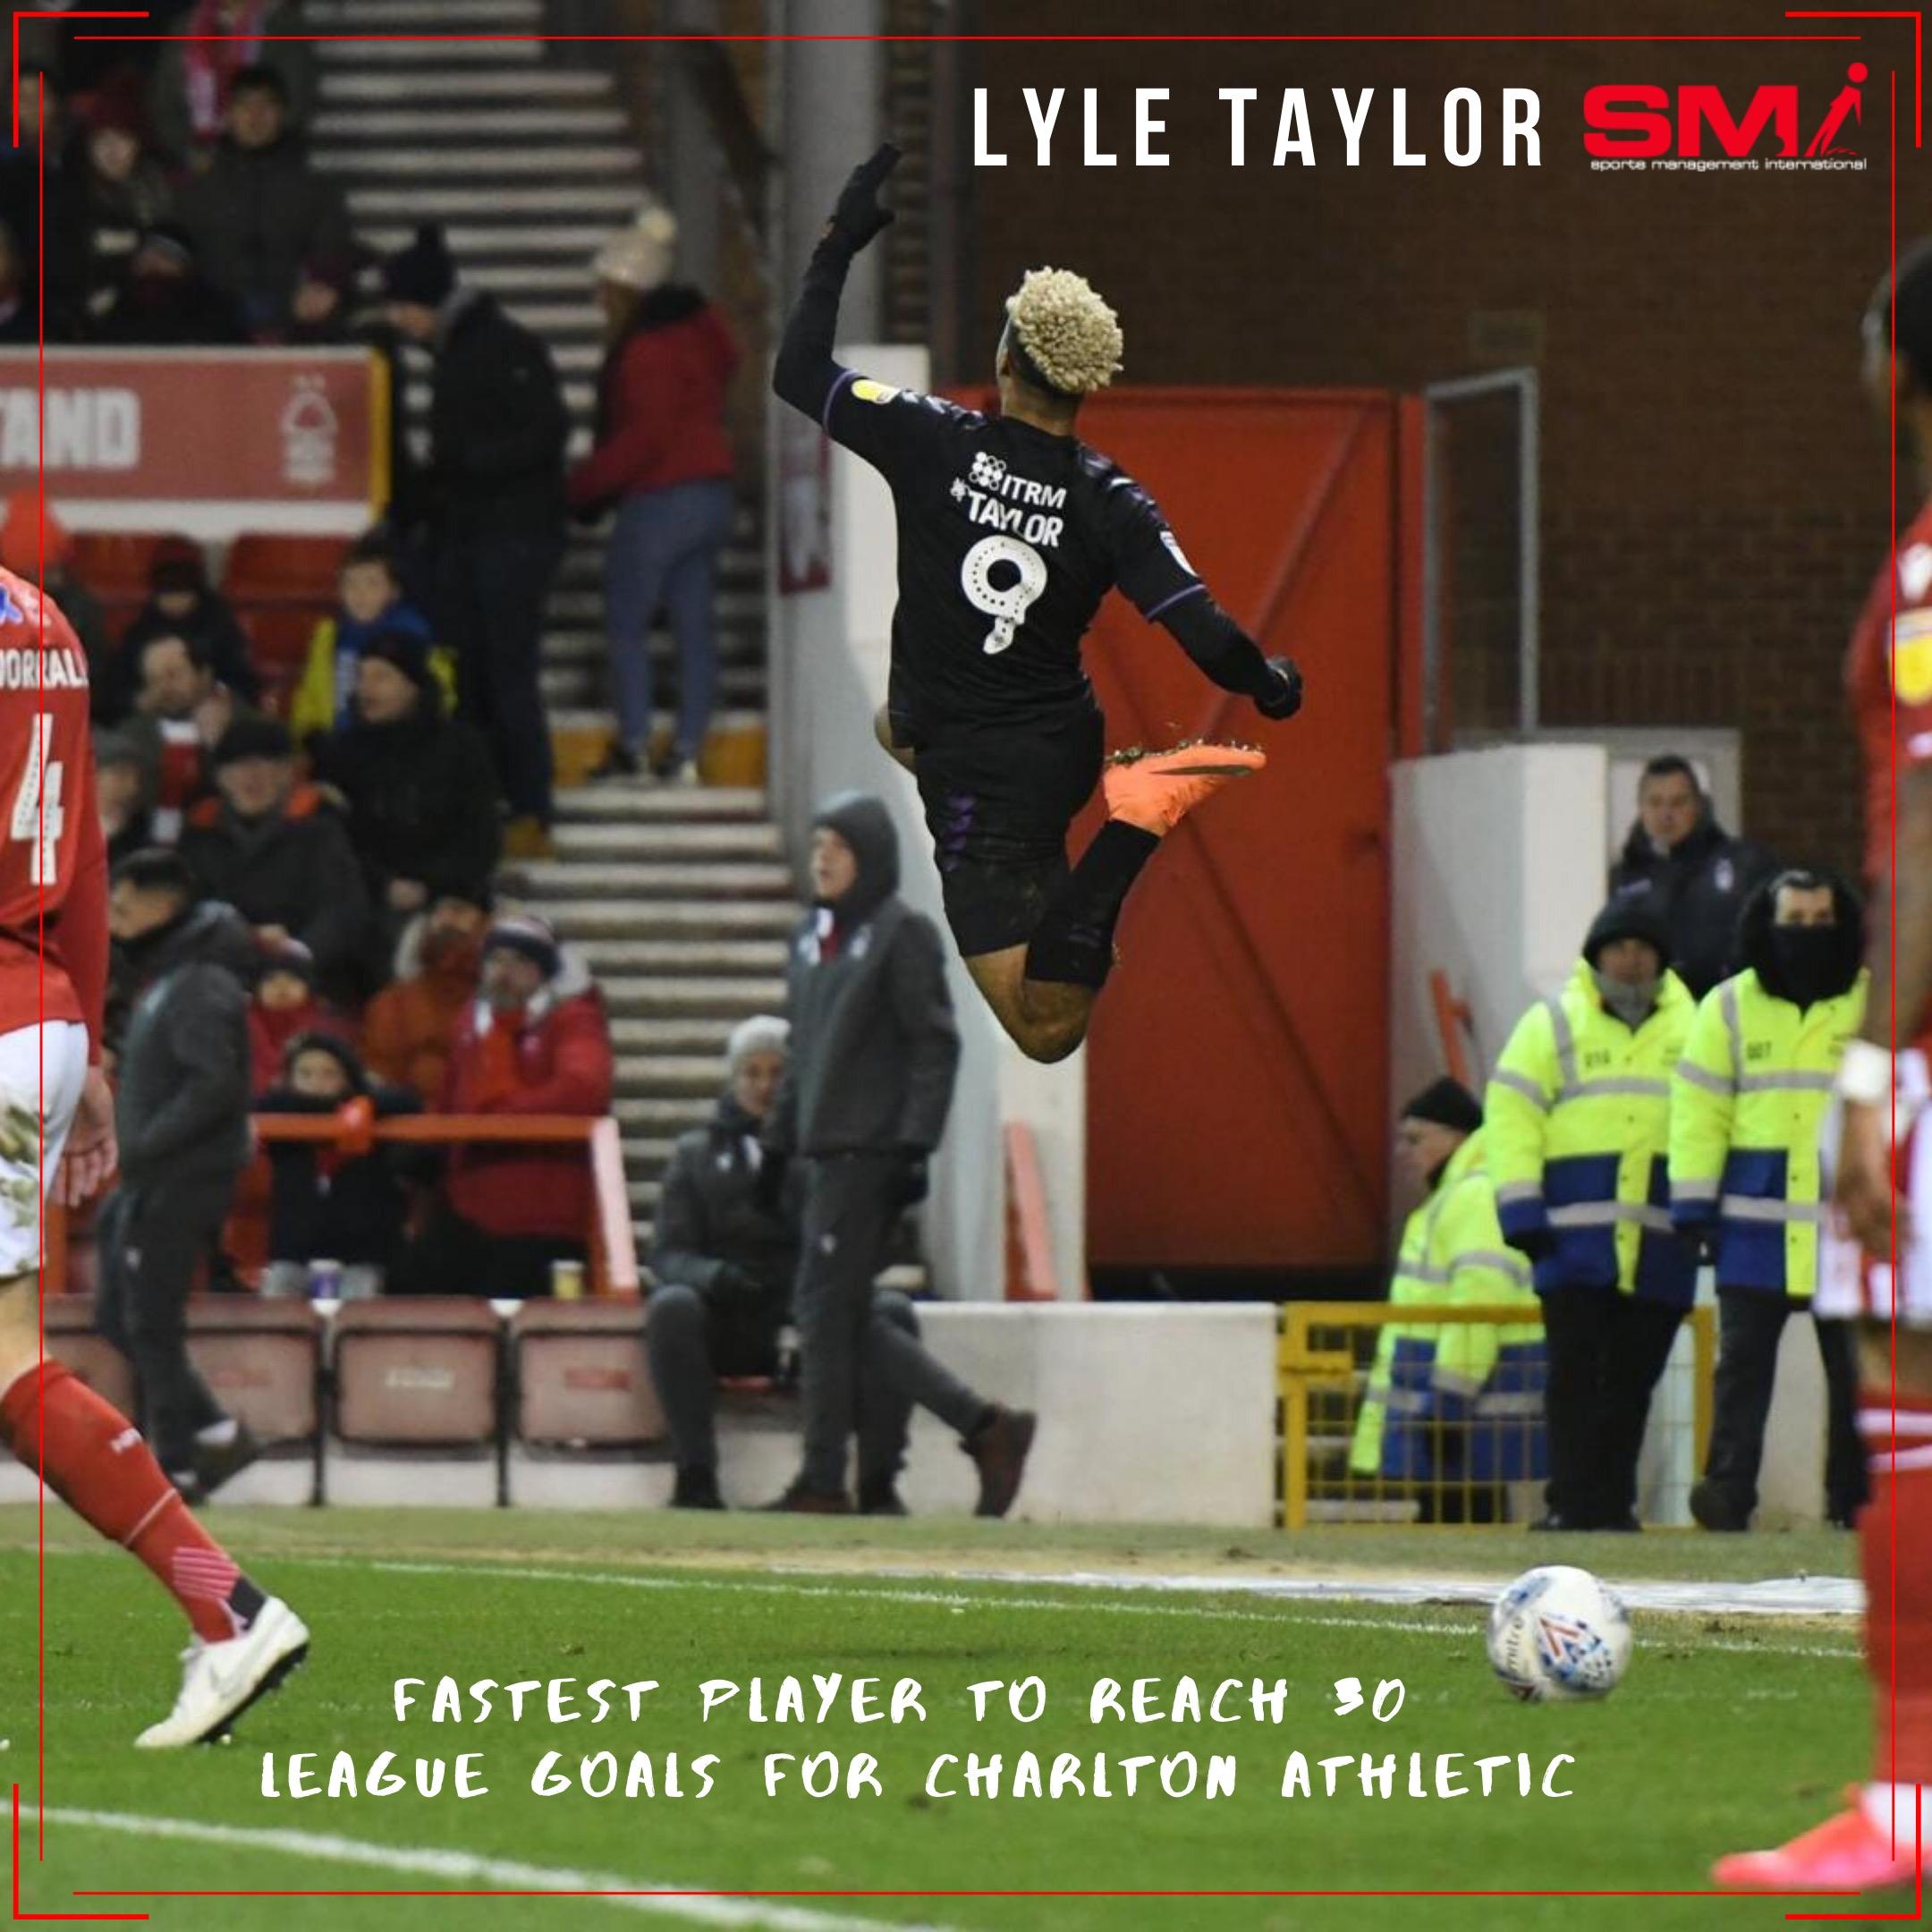 Lyle Taylor Charlton Athletic goal record